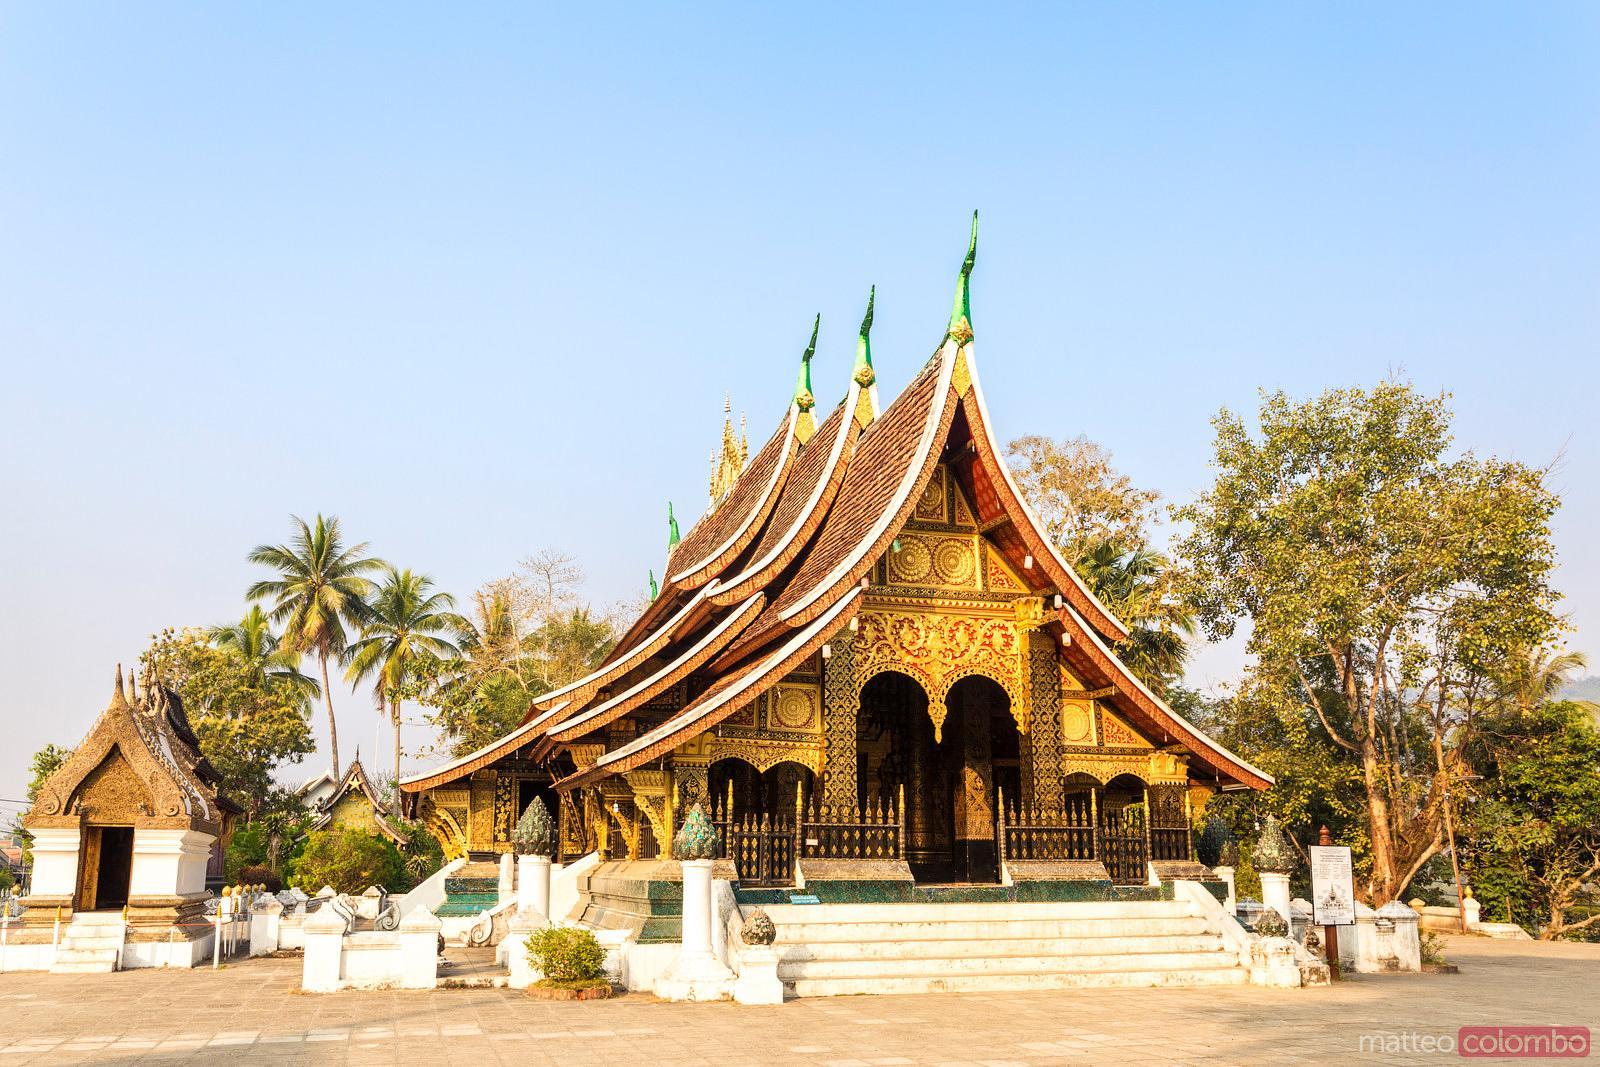 Wat Xieng Thong | Luang Prabang, Laos Attractions - Lonely ... |Wat Xieng Thong Luang Prabang